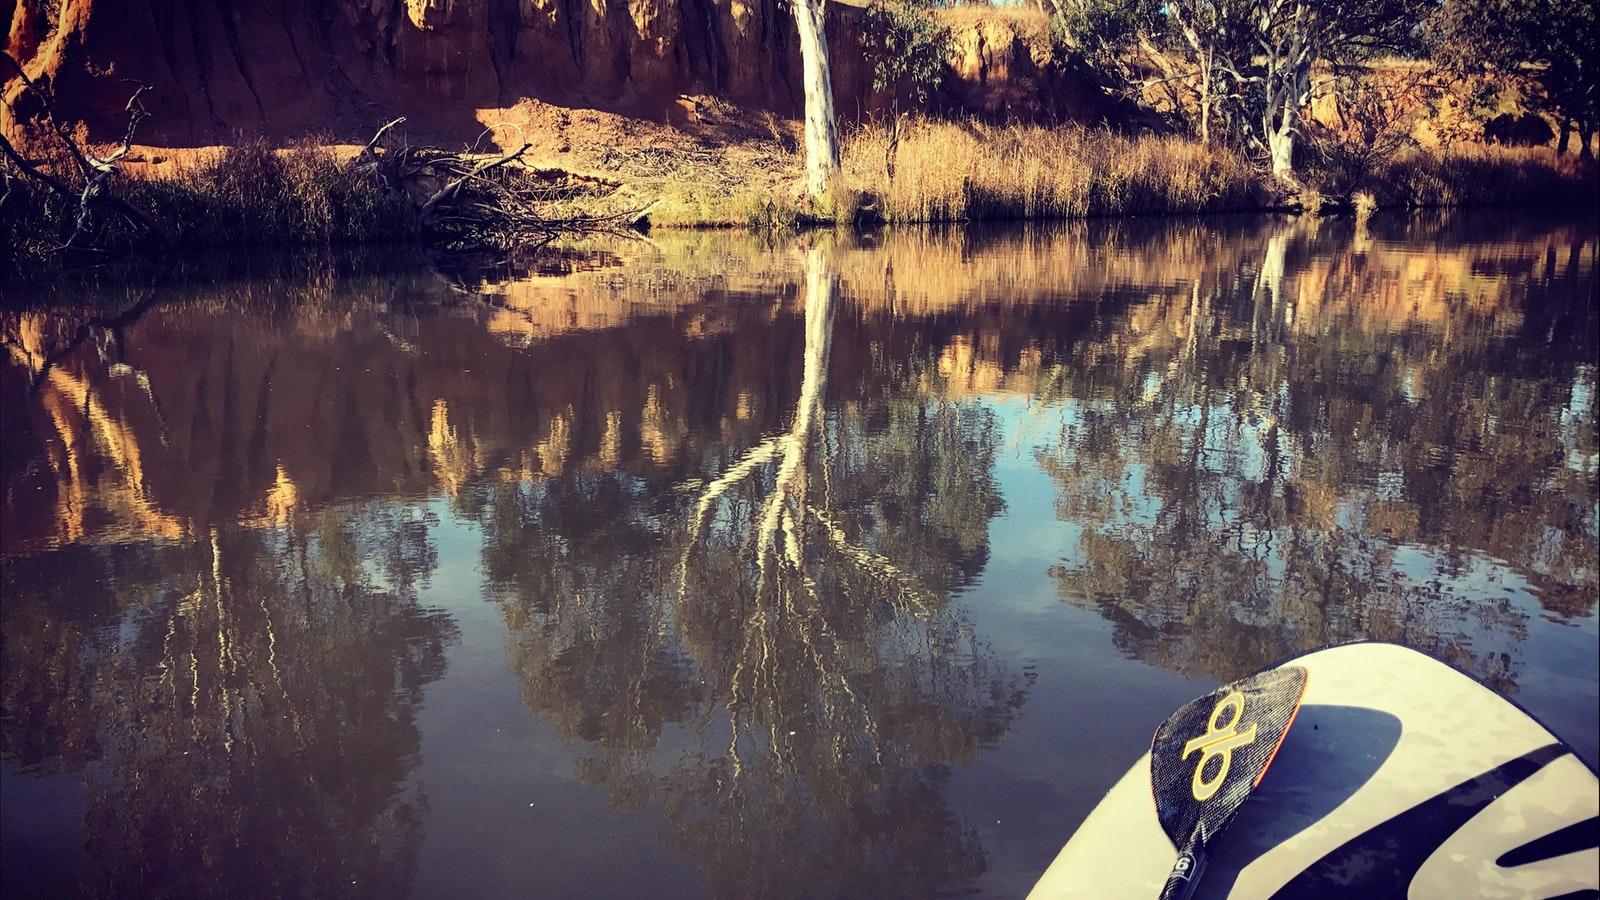 Reflections in the Australian bush